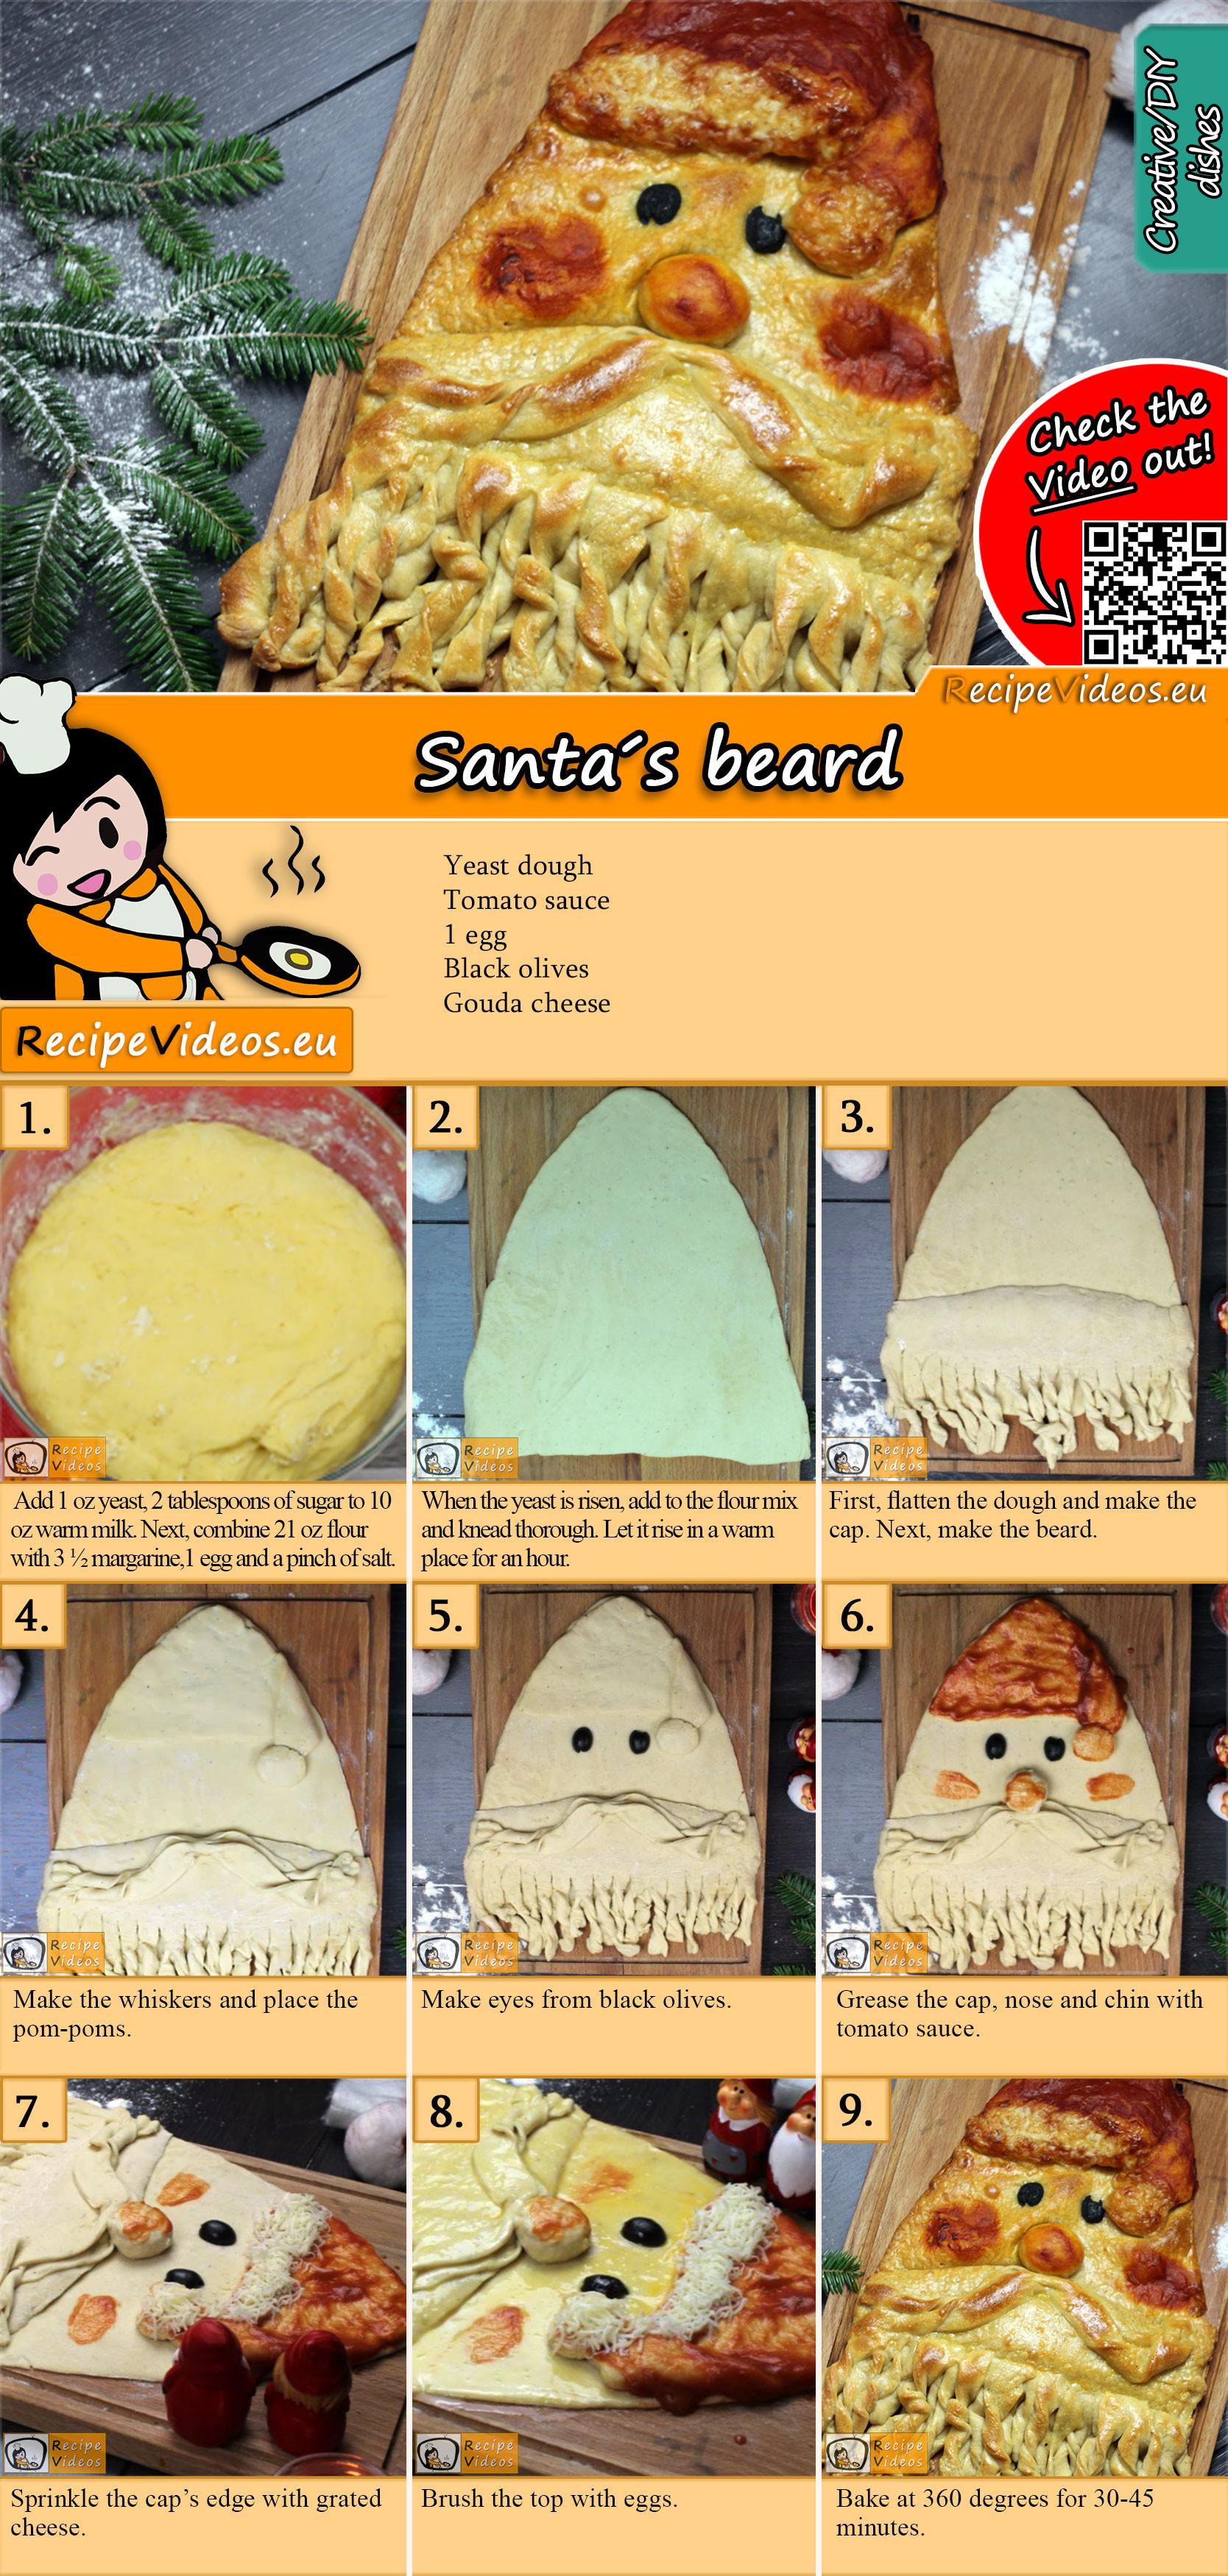 Santa's beard recipe with video